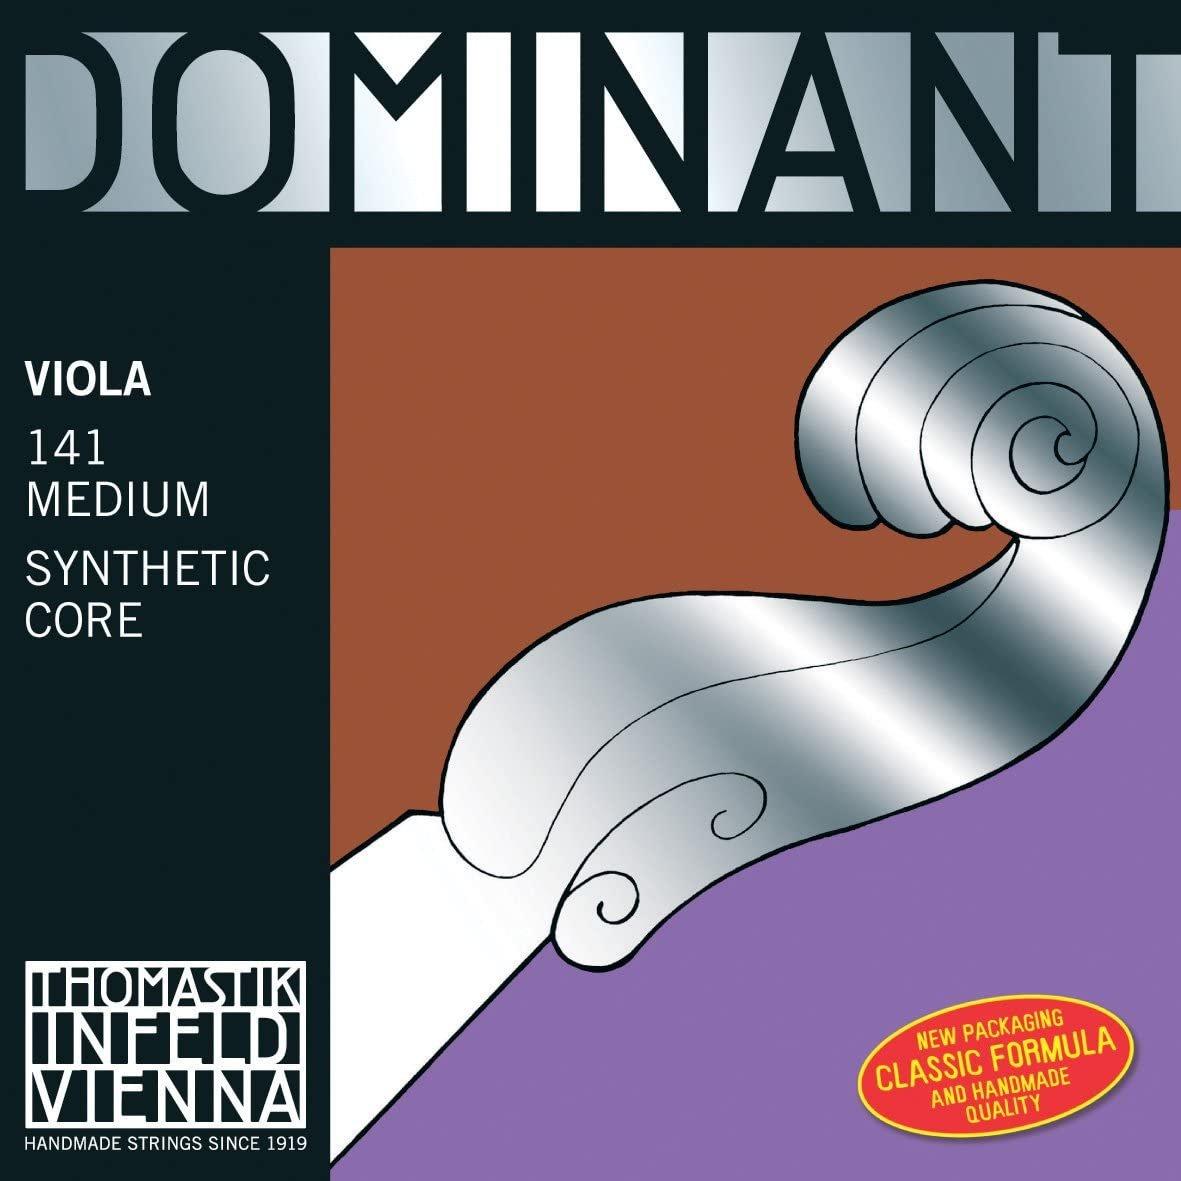 Thomastik 141 Dominant Viola 14.5-15.5 Set